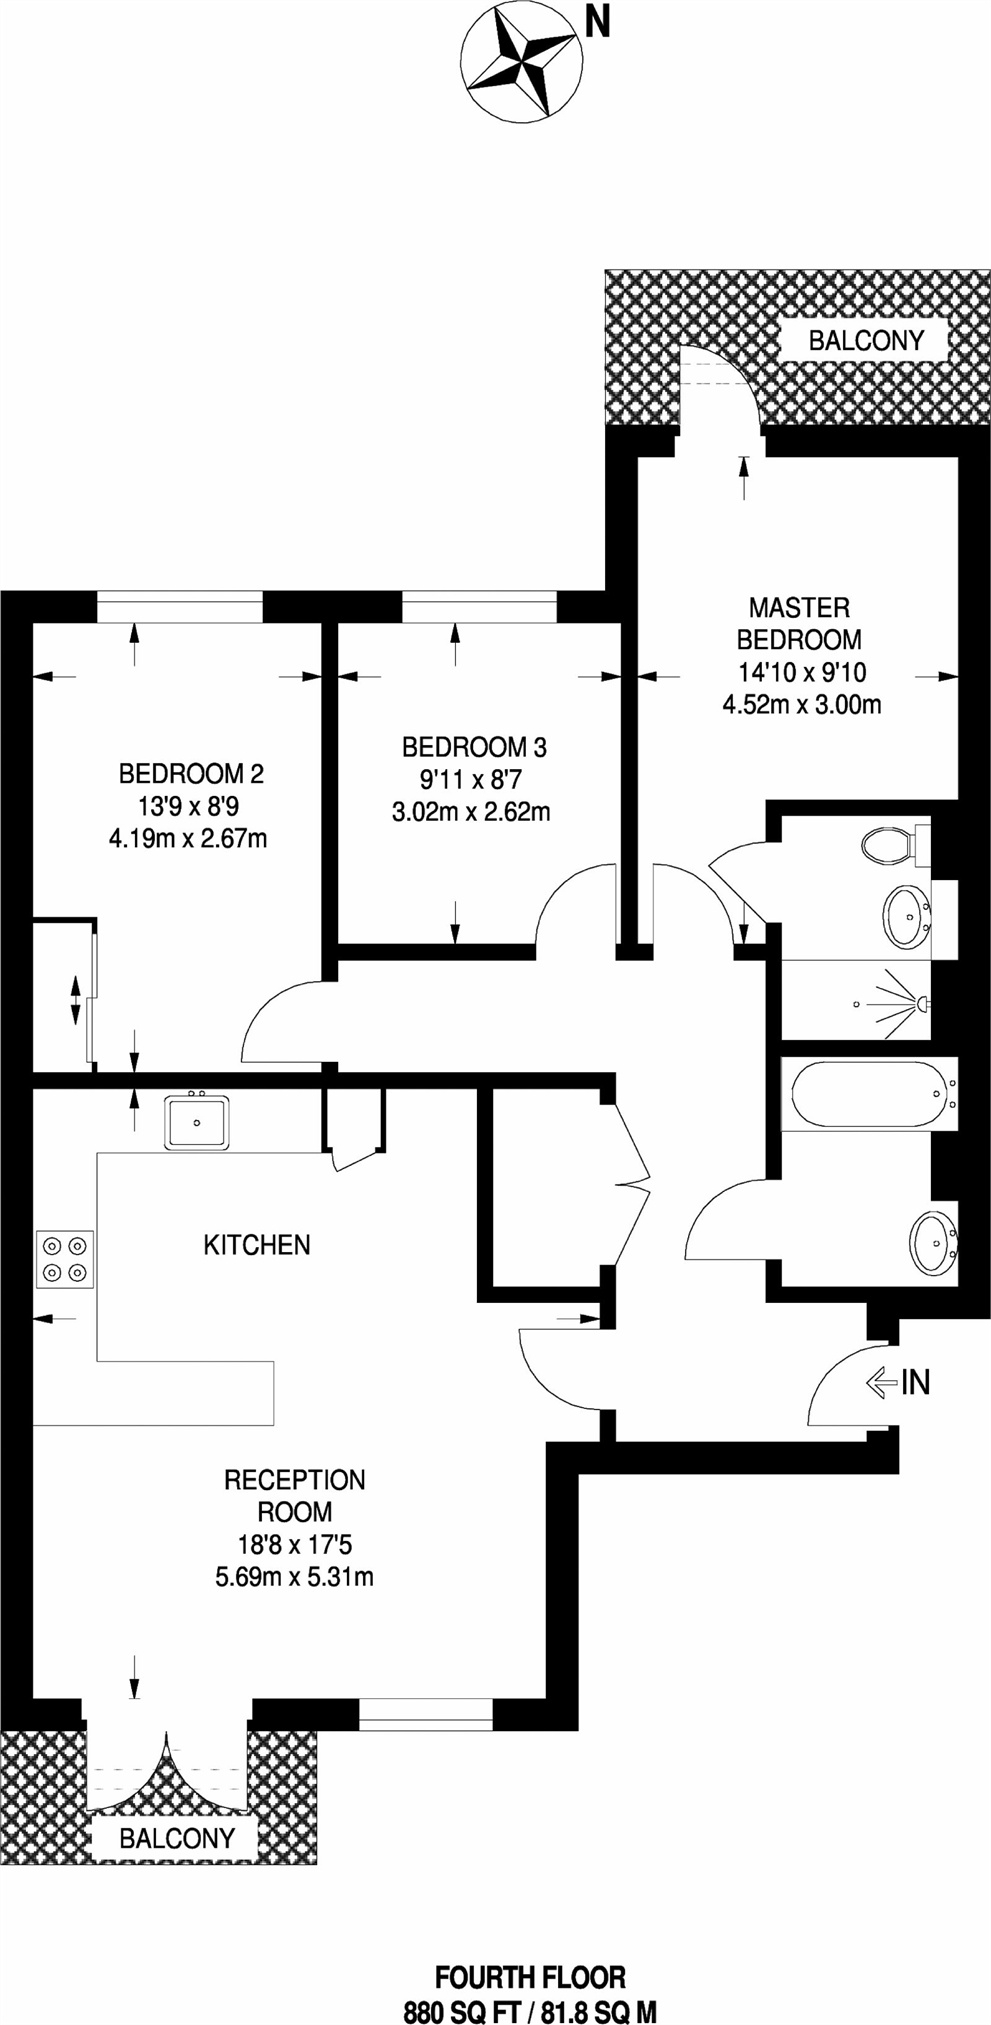 Voysey Square, London E3, 3 bedroom flat for sale